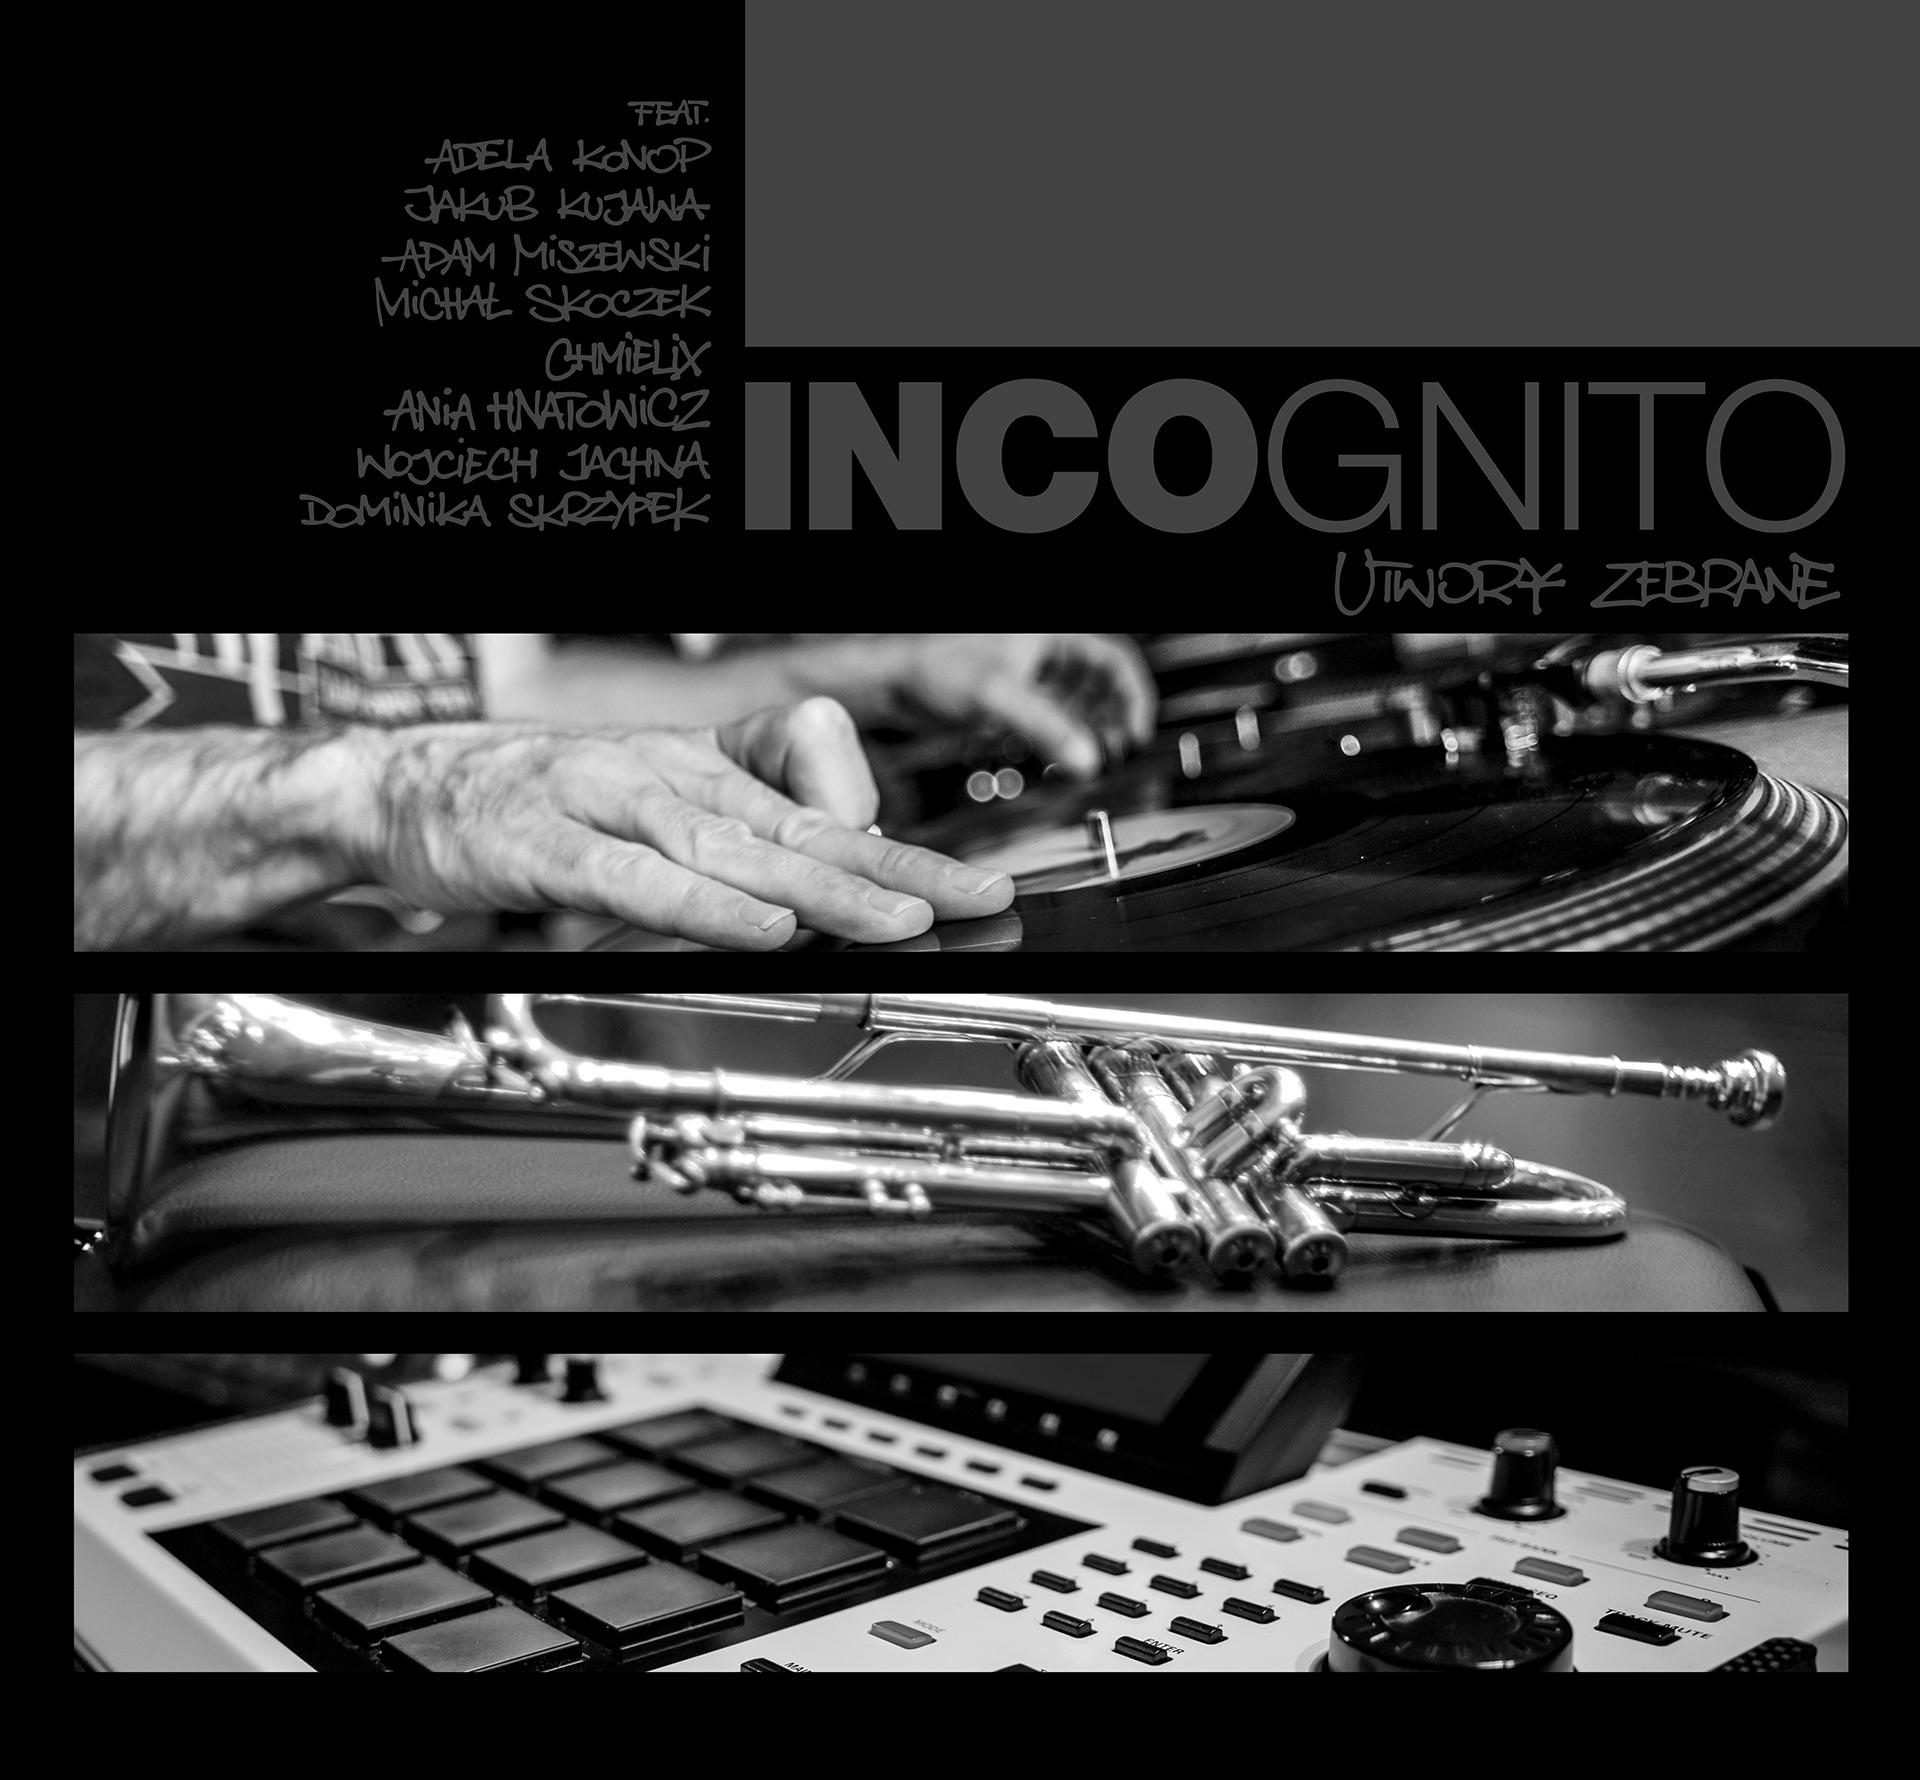 incognito_plyta_okladka-karta